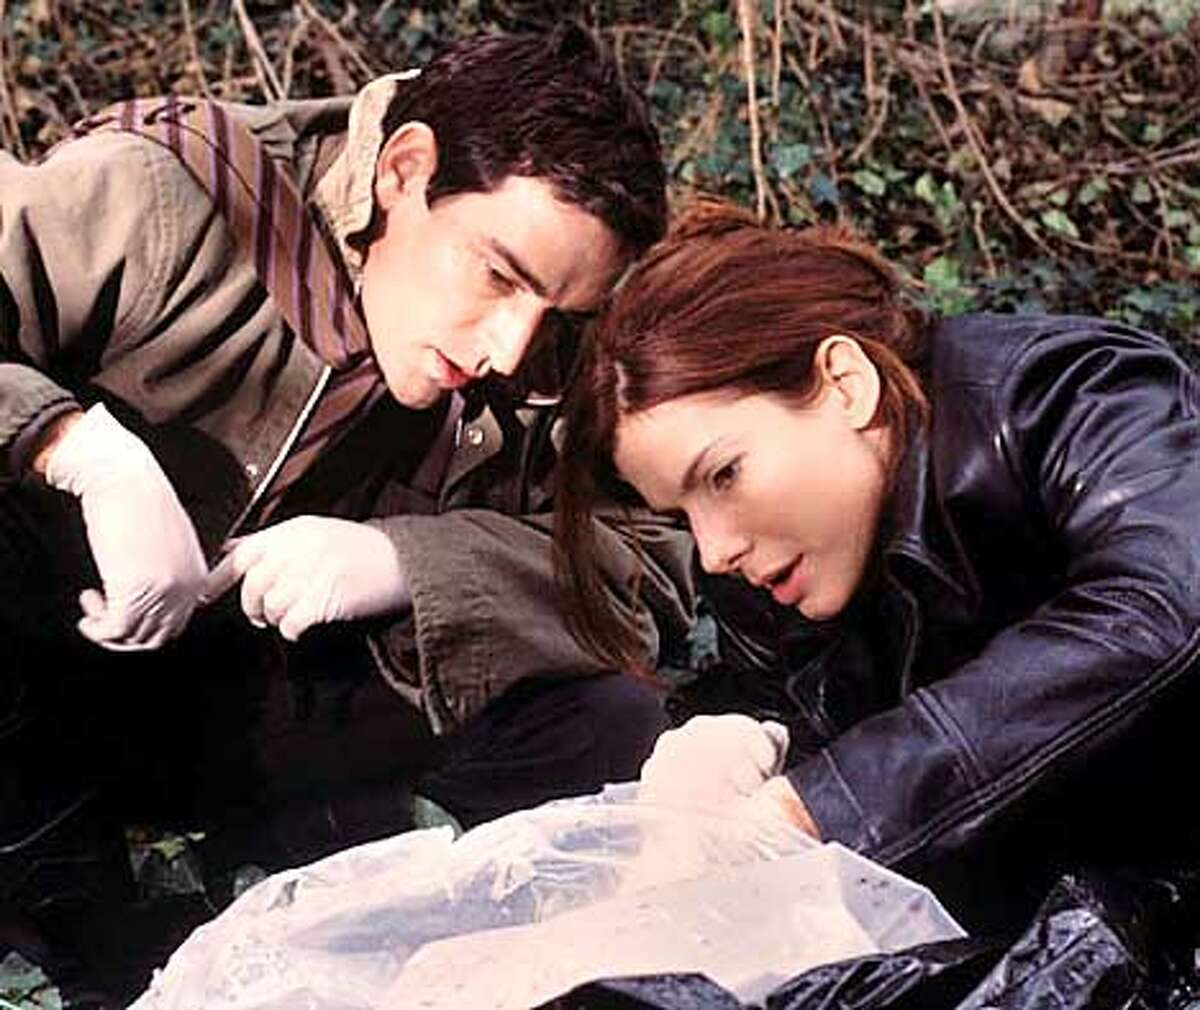 Cassie (Sandra Bullock) and her partner (Ben Chaplin) investigate a crime scene in the thriller